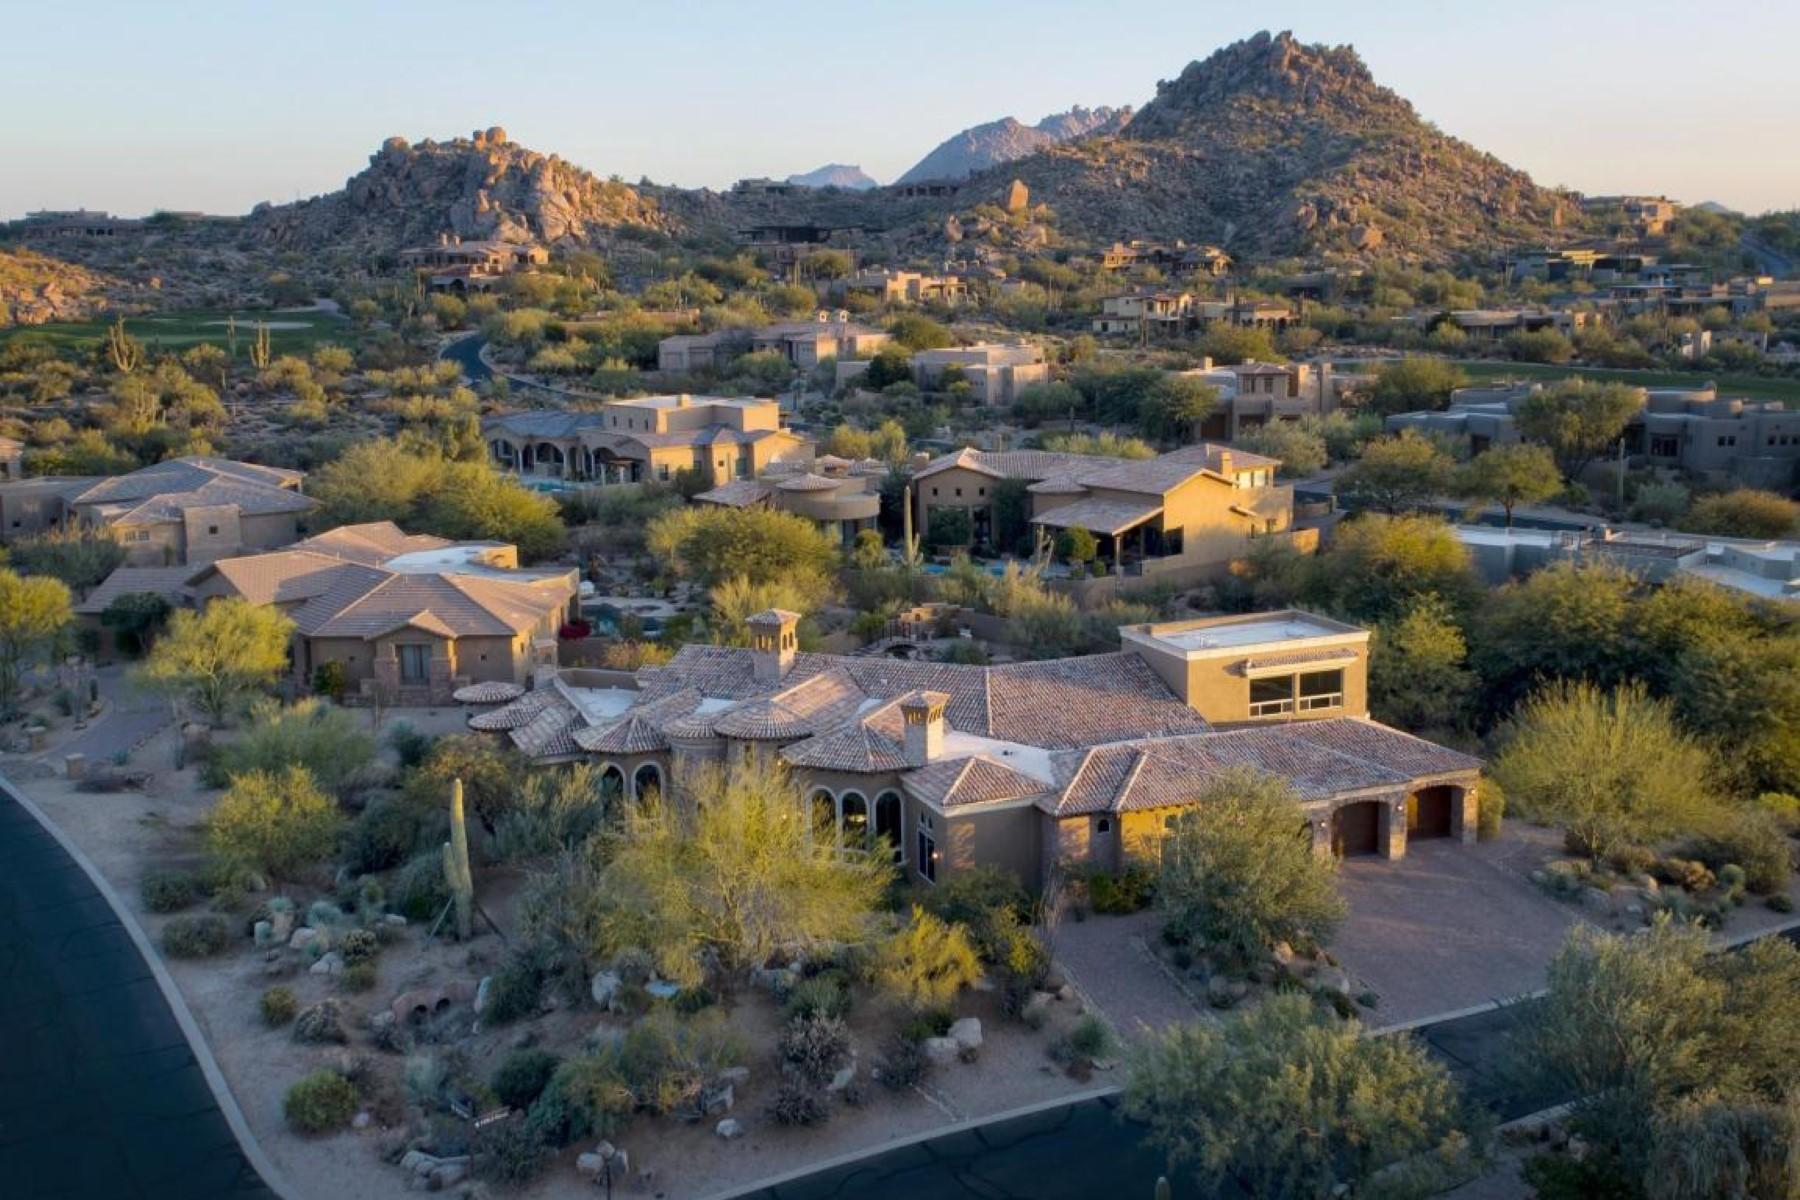 Single Family Home for Sale at Architecturally Beautiful Custom Home 10303 E MARK LN 21, Scottsdale, Arizona, 85262 United States